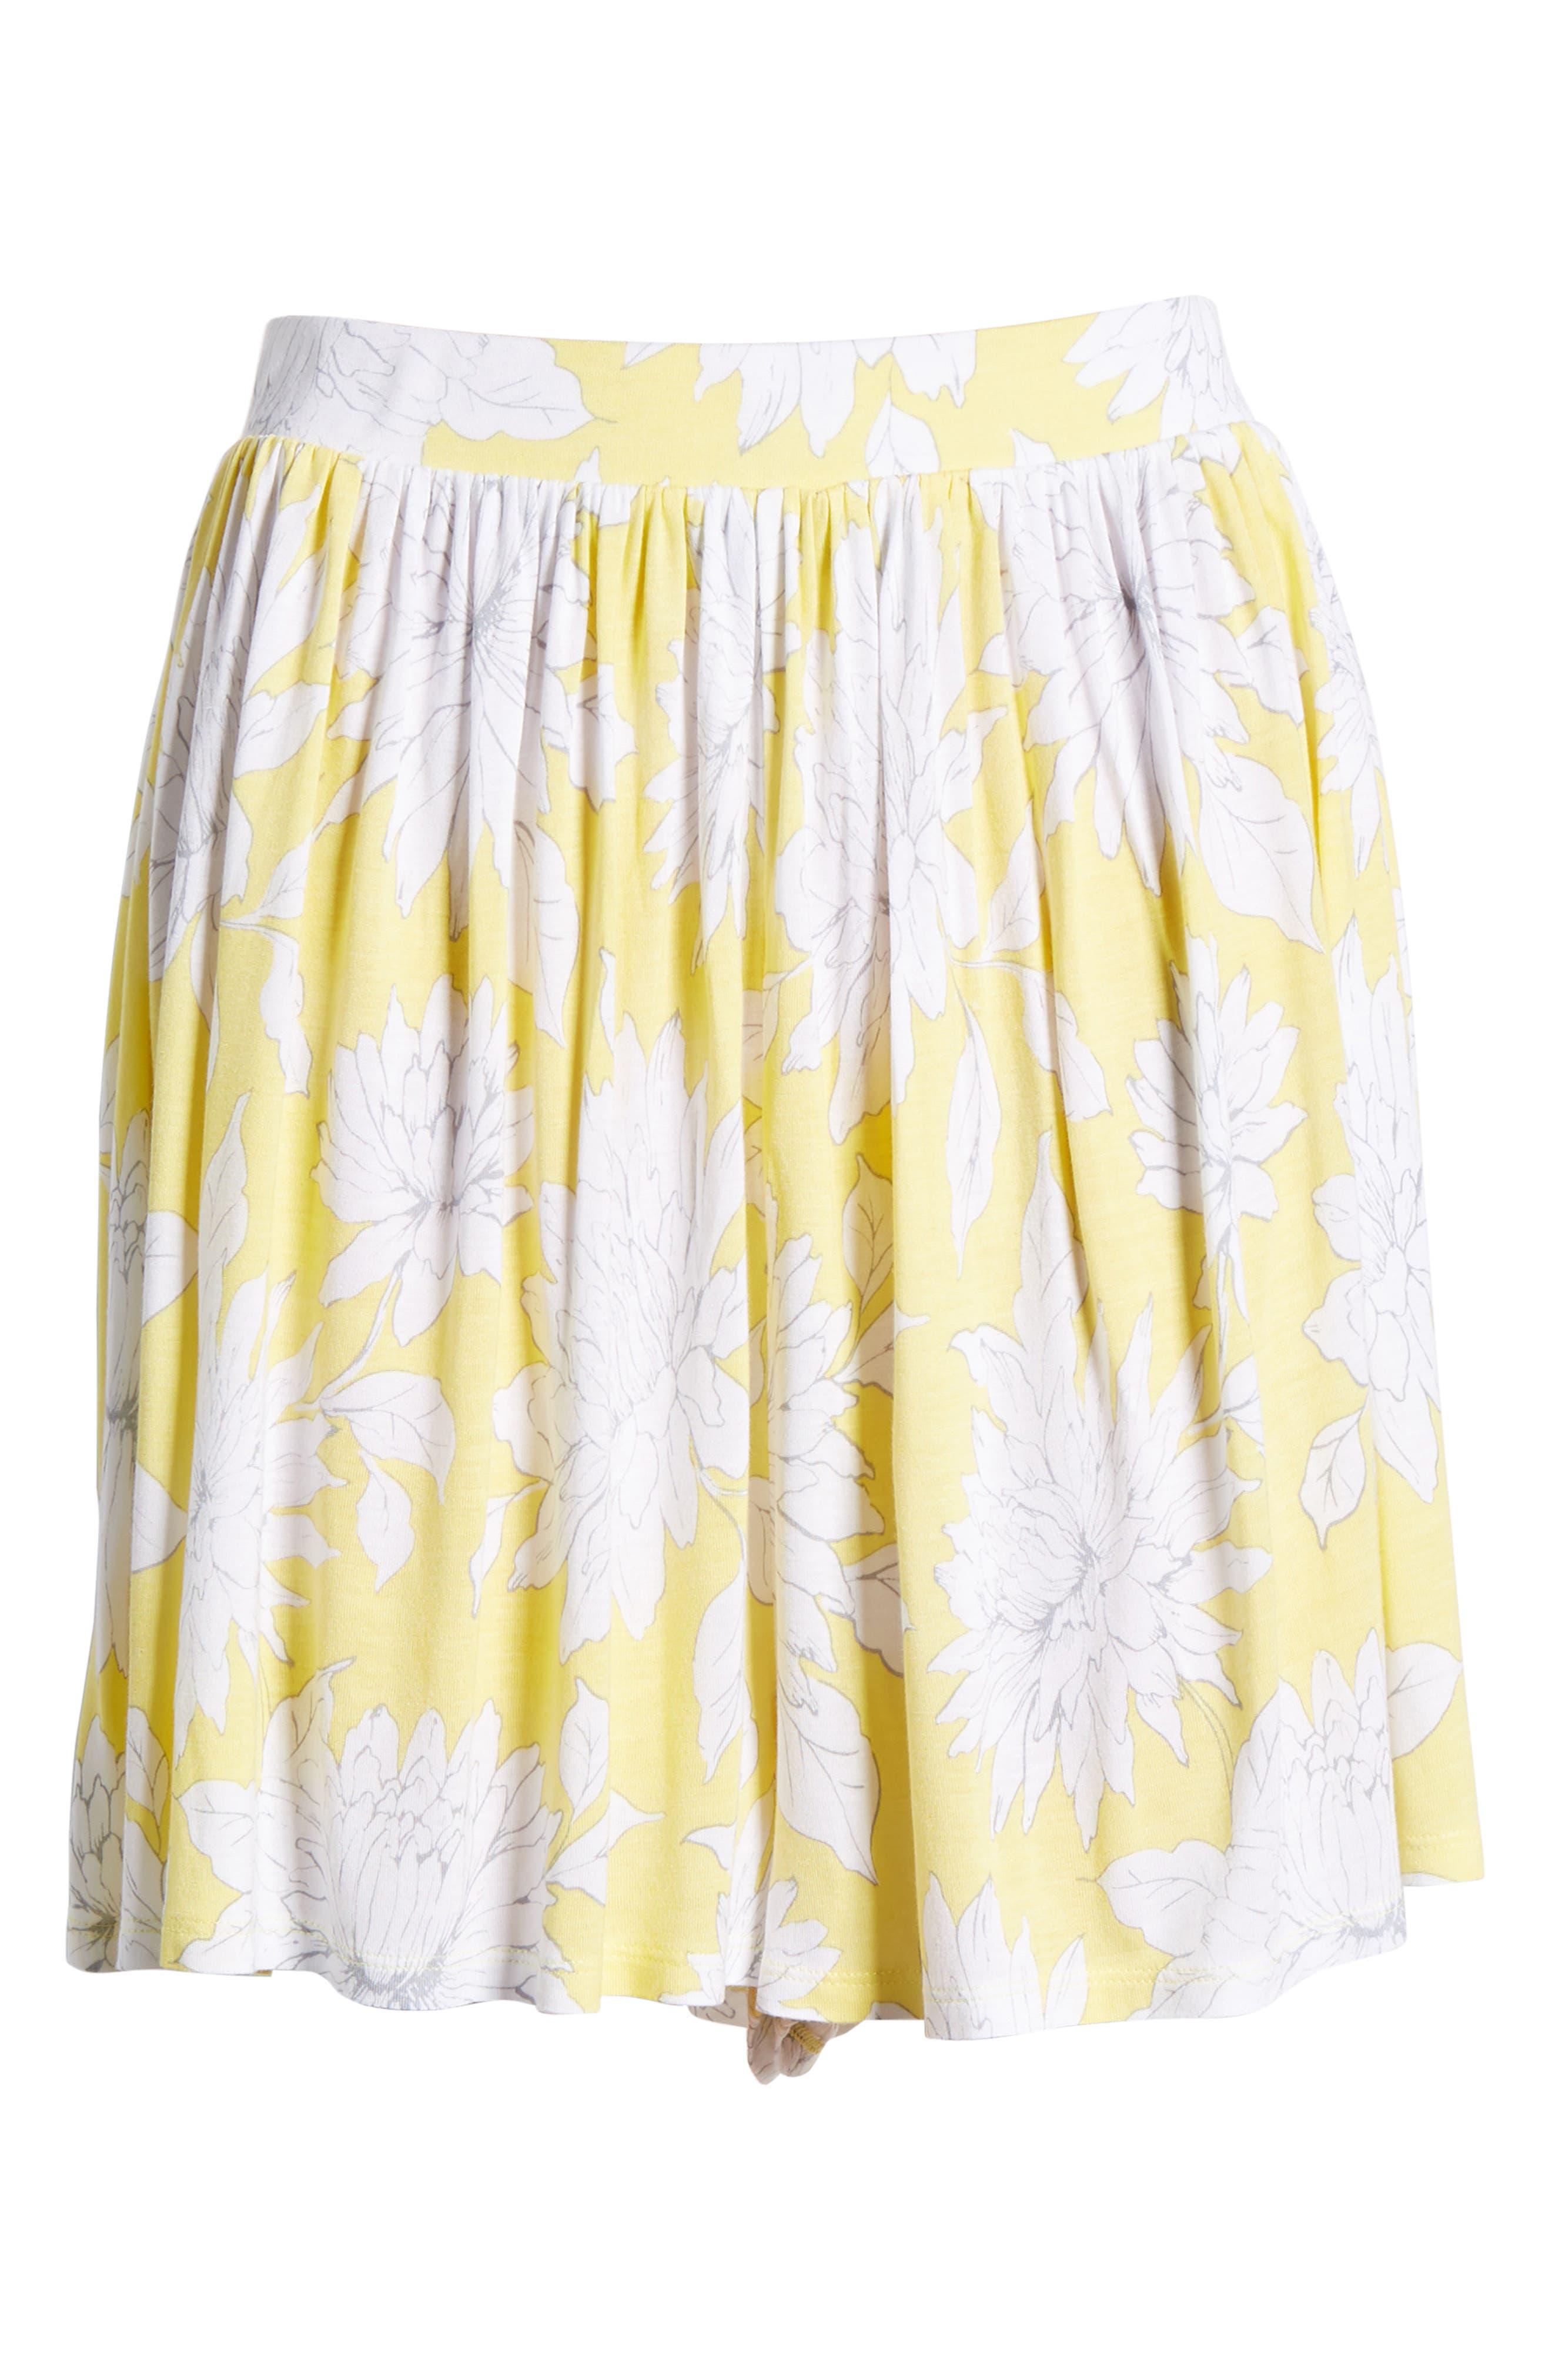 Print Wide Leg Shorts,                             Alternate thumbnail 6, color,                             Yellow Glow Grunge Floral